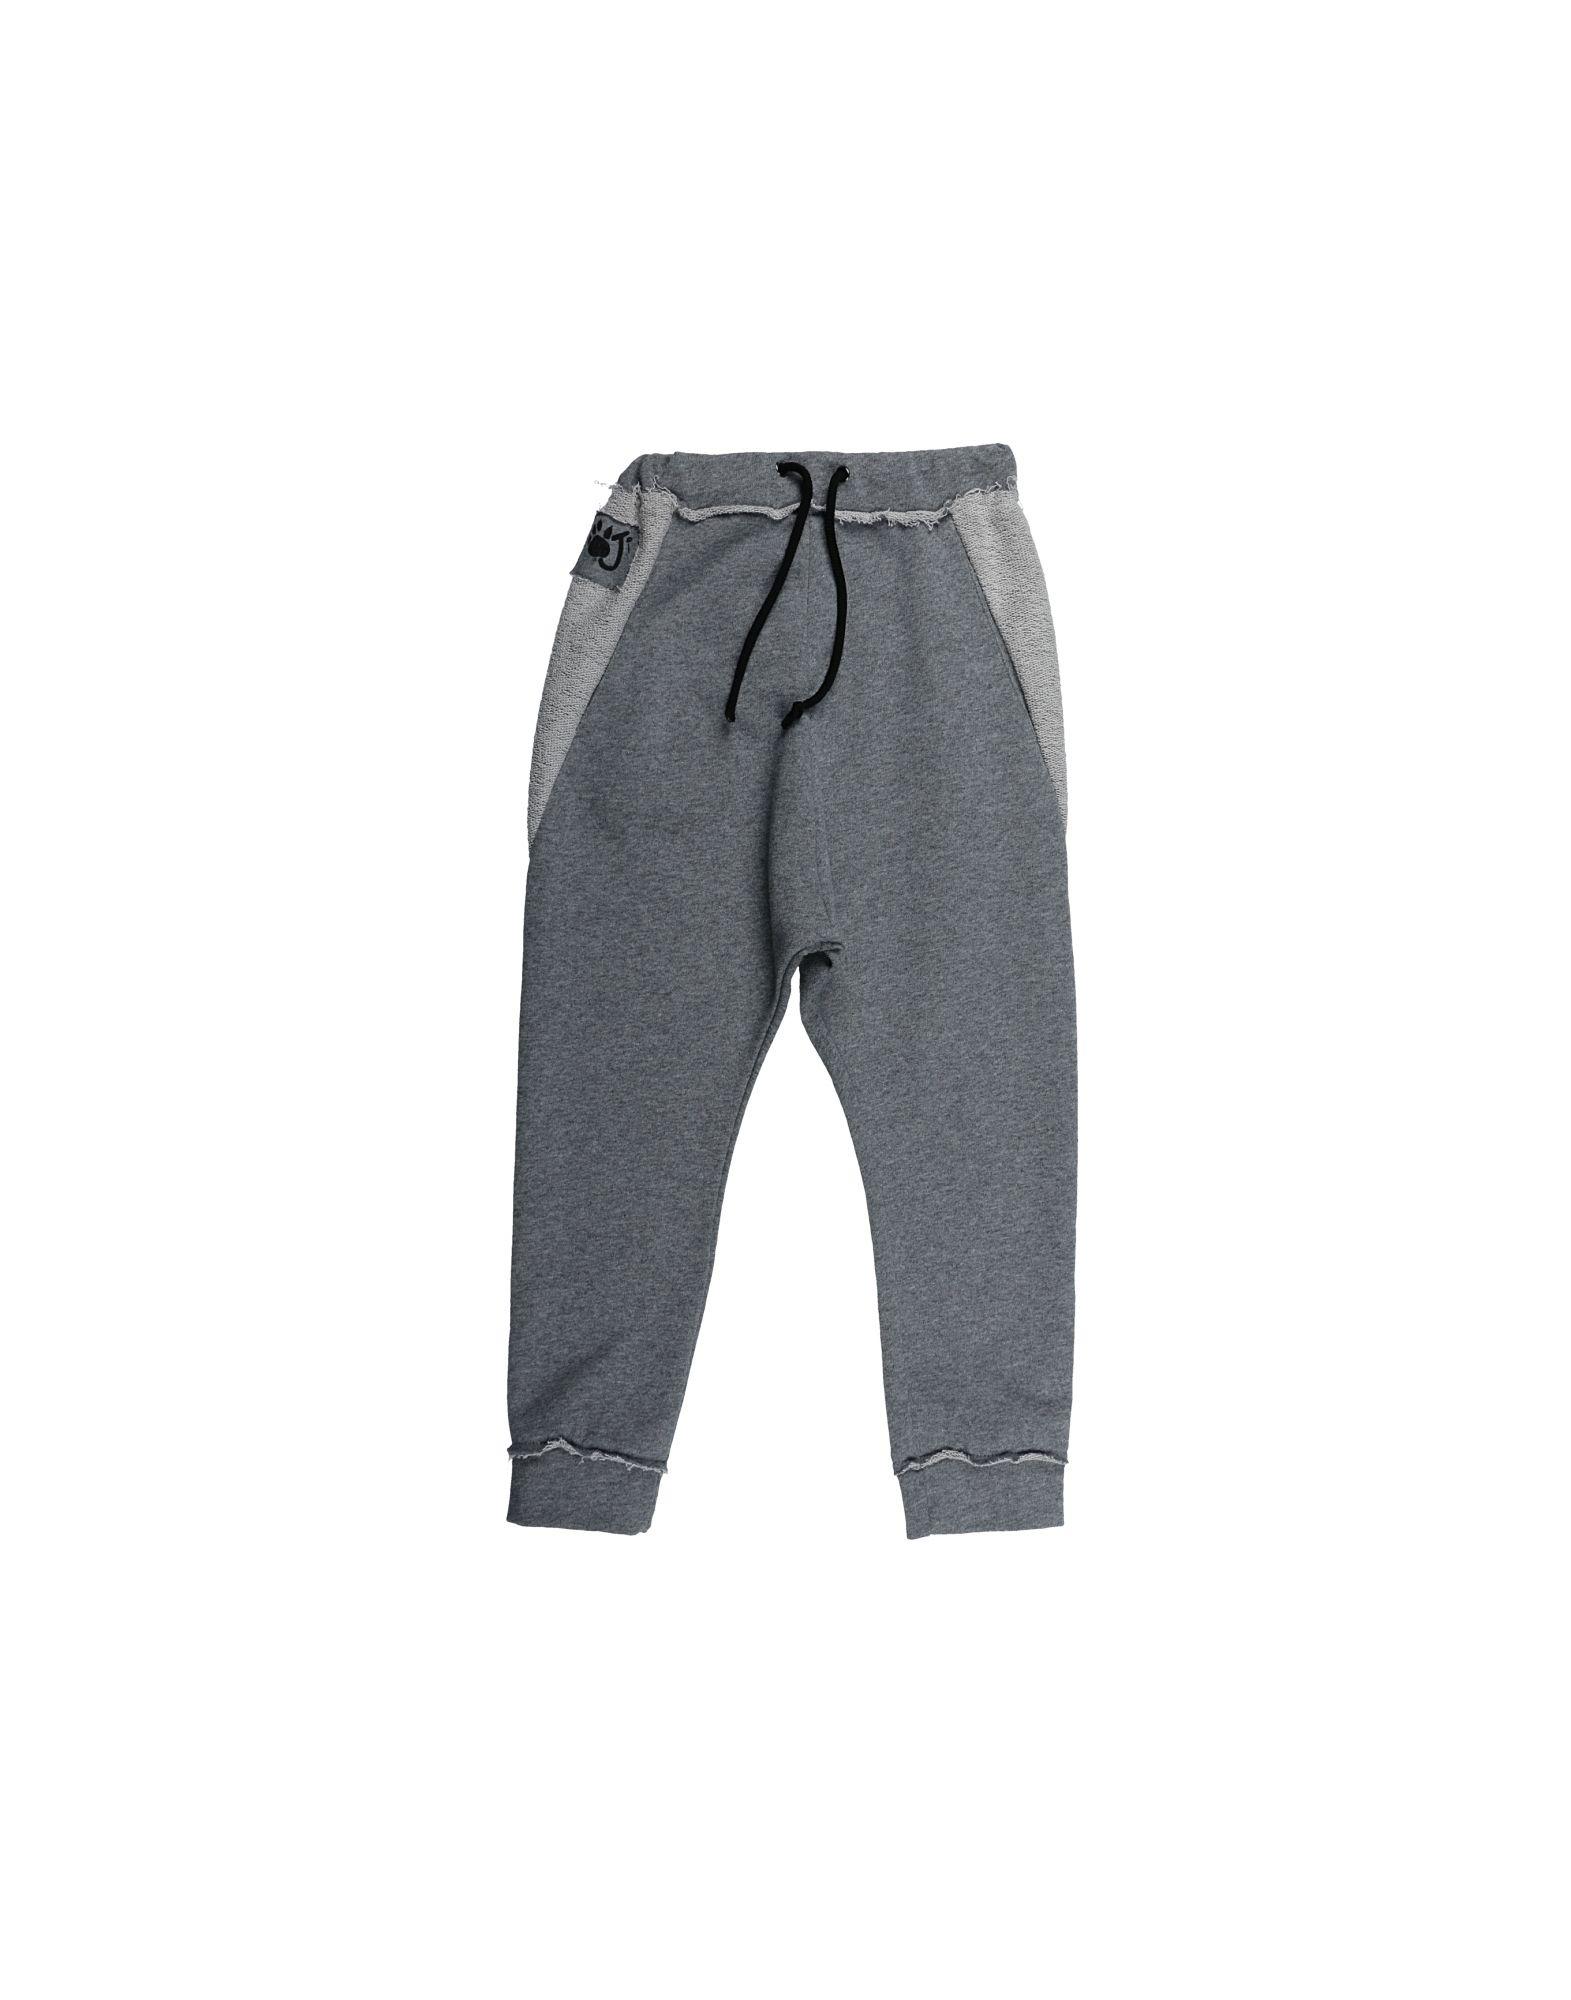 OJIreg Casual pants